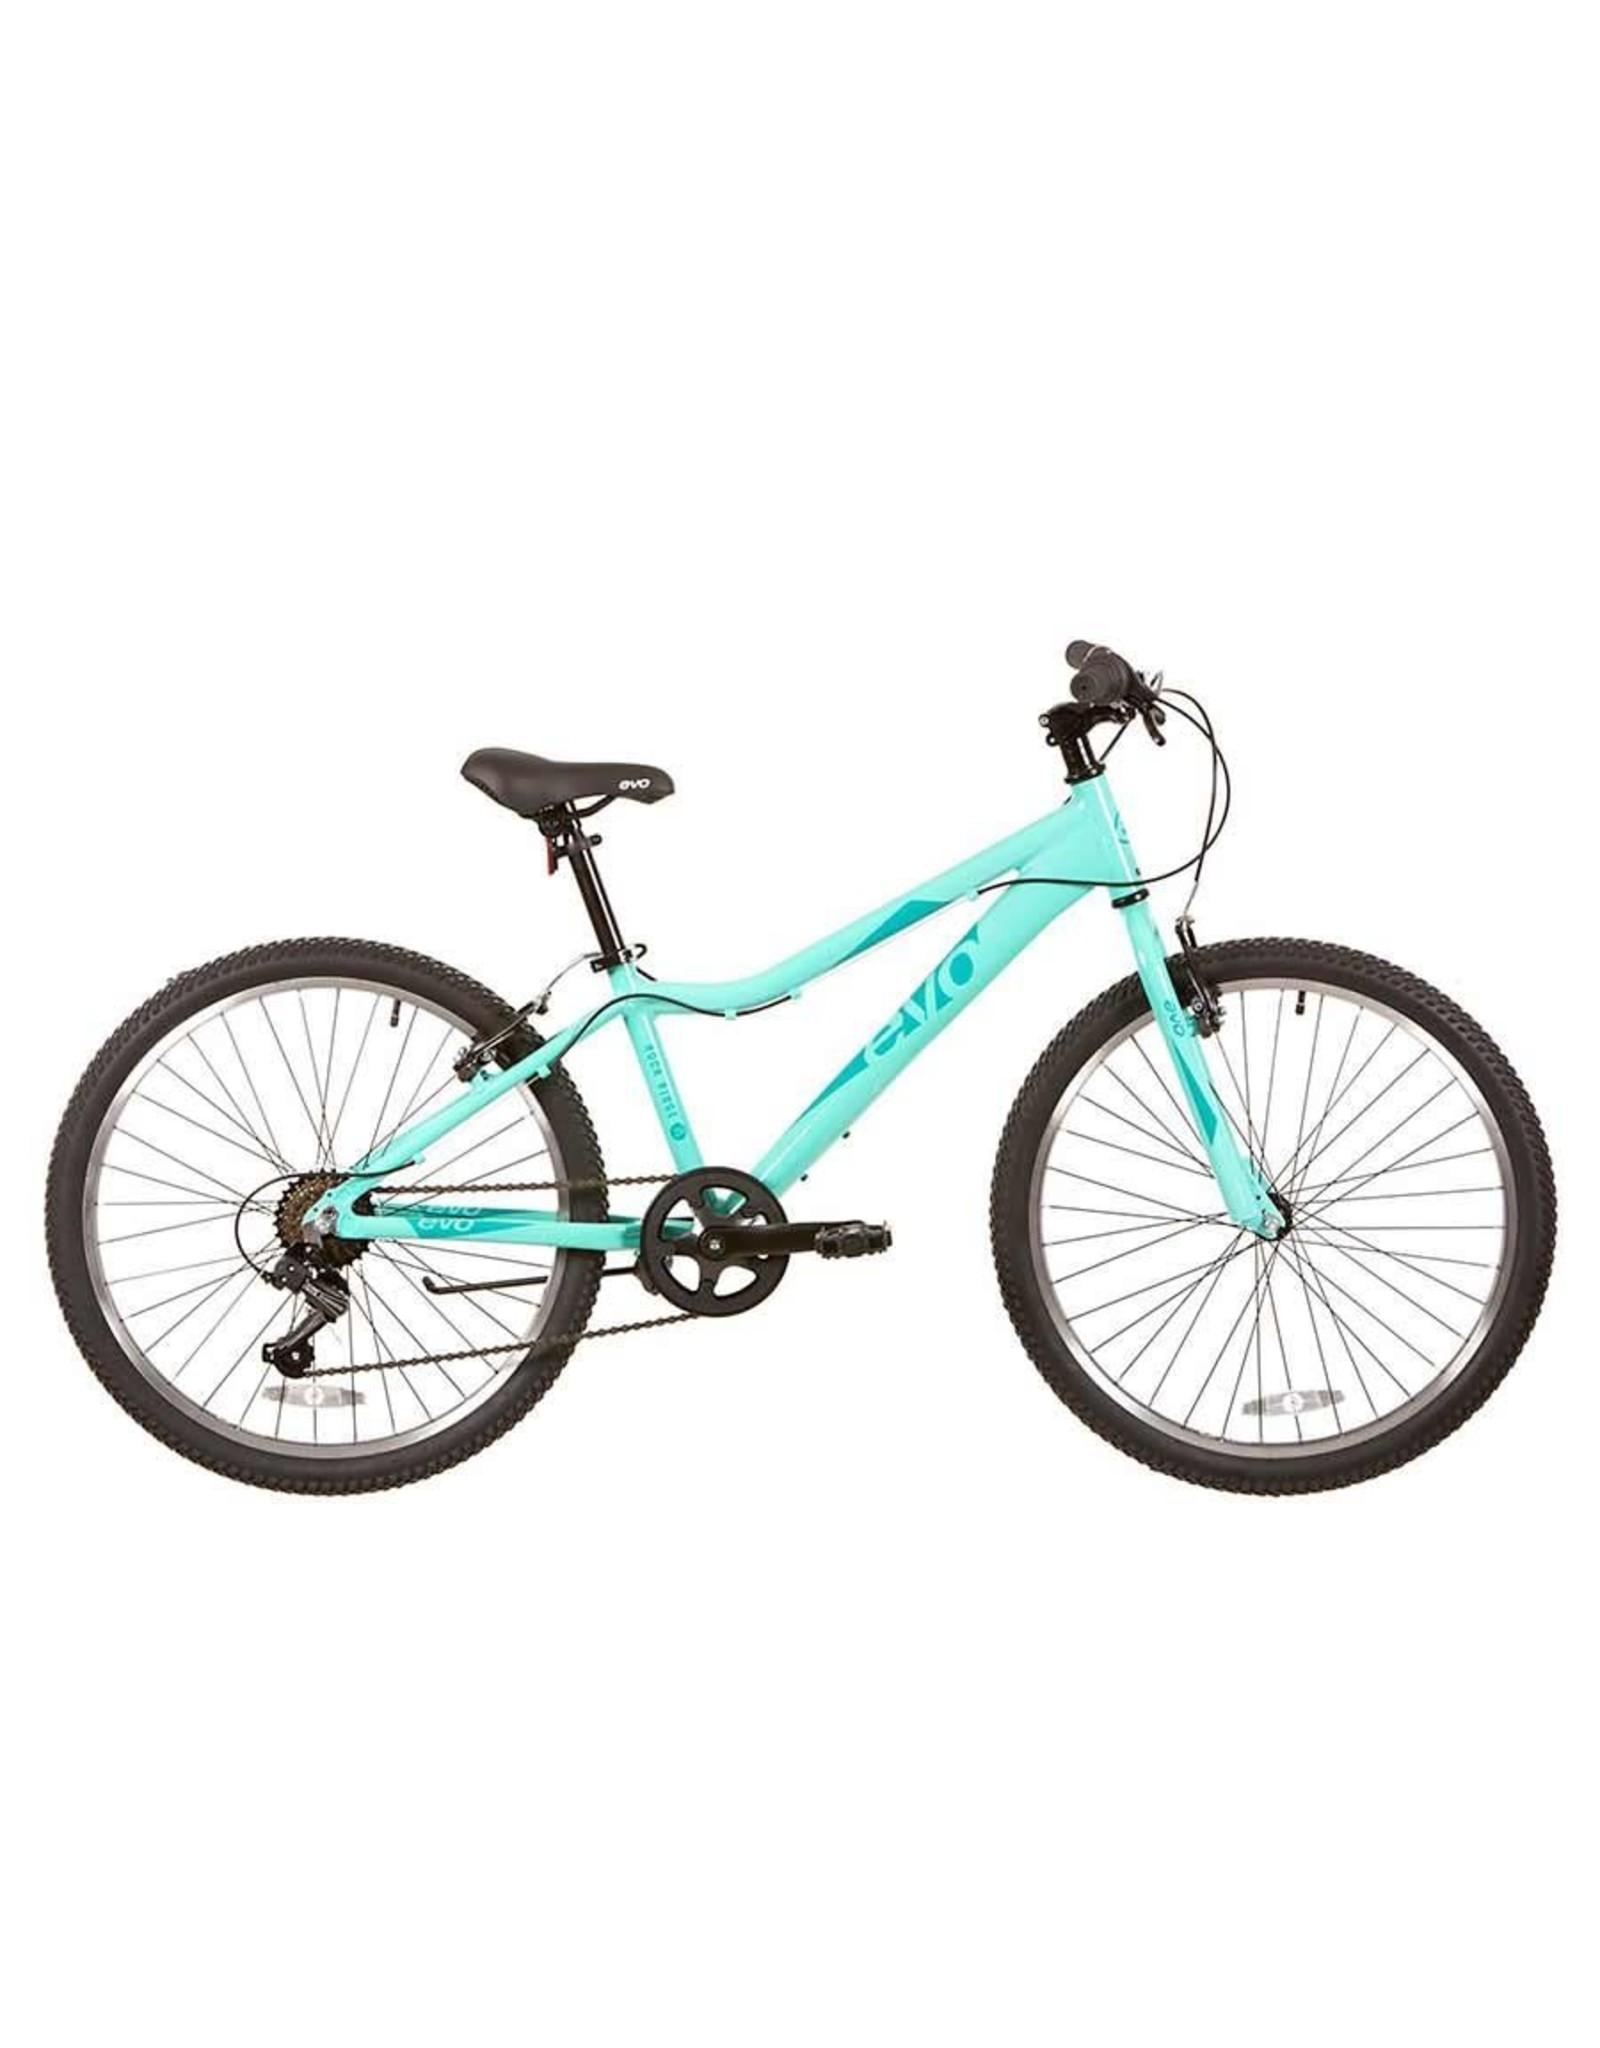 EVO EVO, Rock Ridge 24, Kids Bicycle, 24'', Fresh Green, U